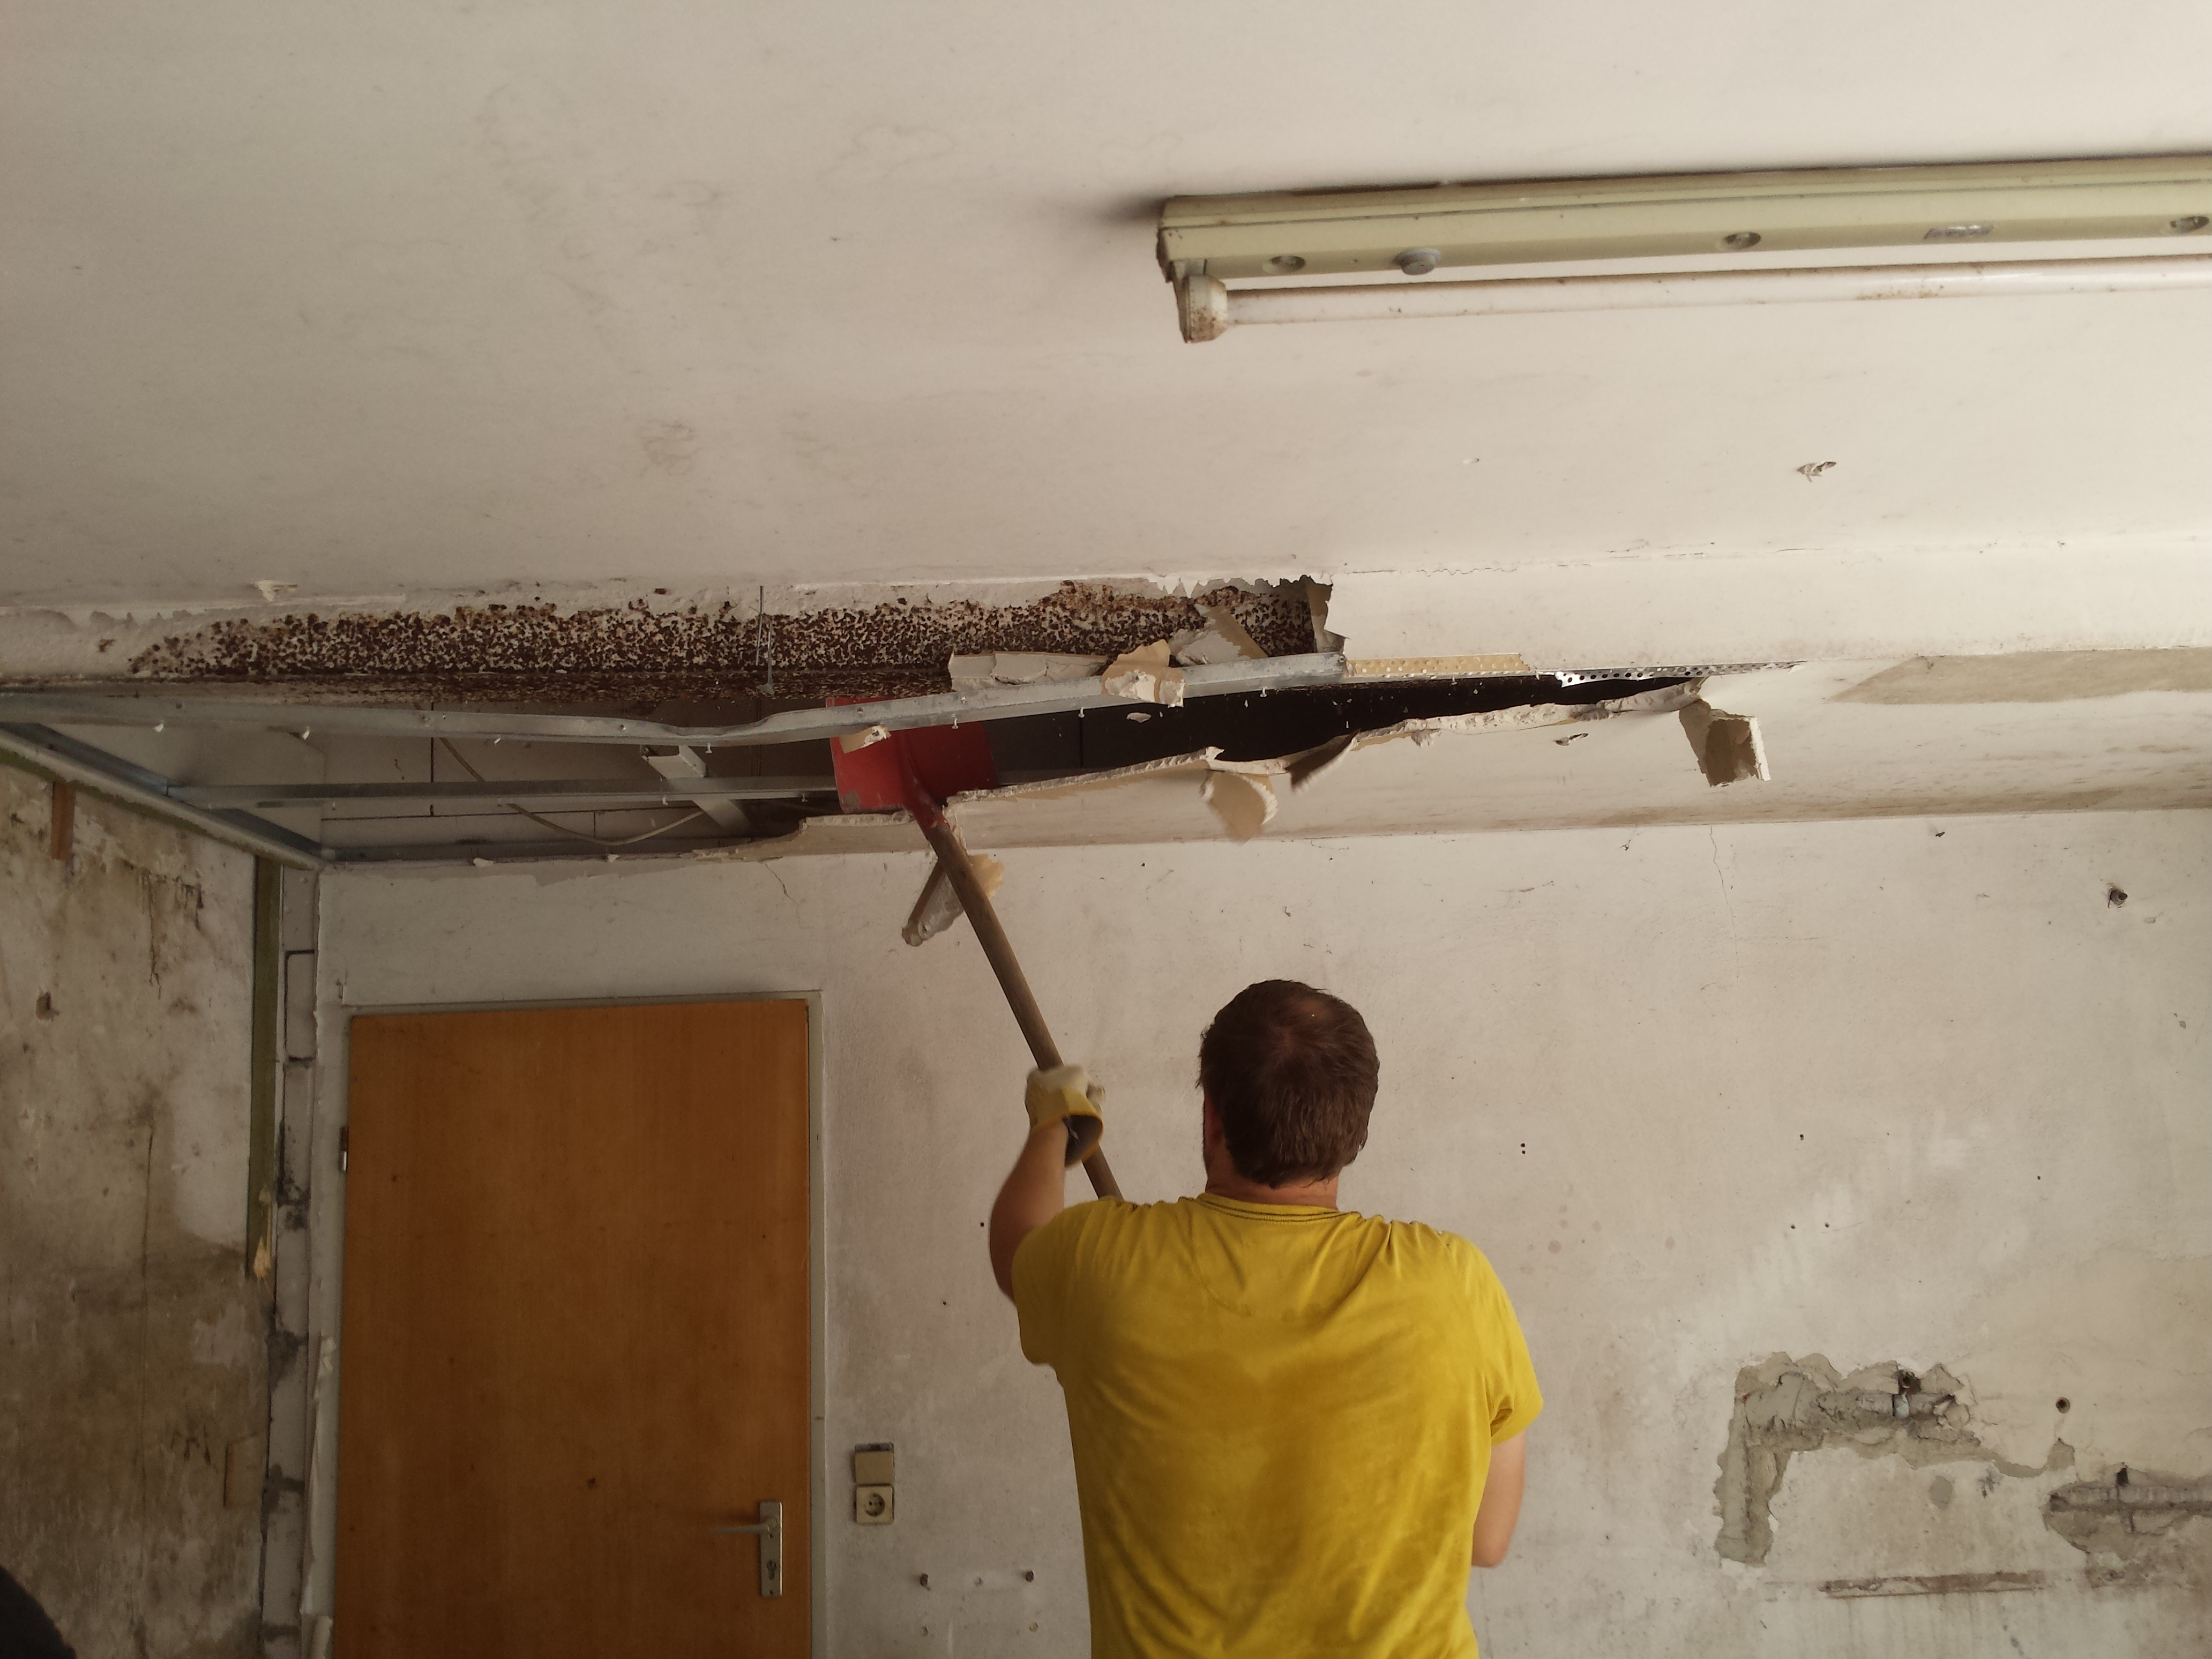 Plattenbau Garage: ausse hui, unne pfui! – Hof Isem